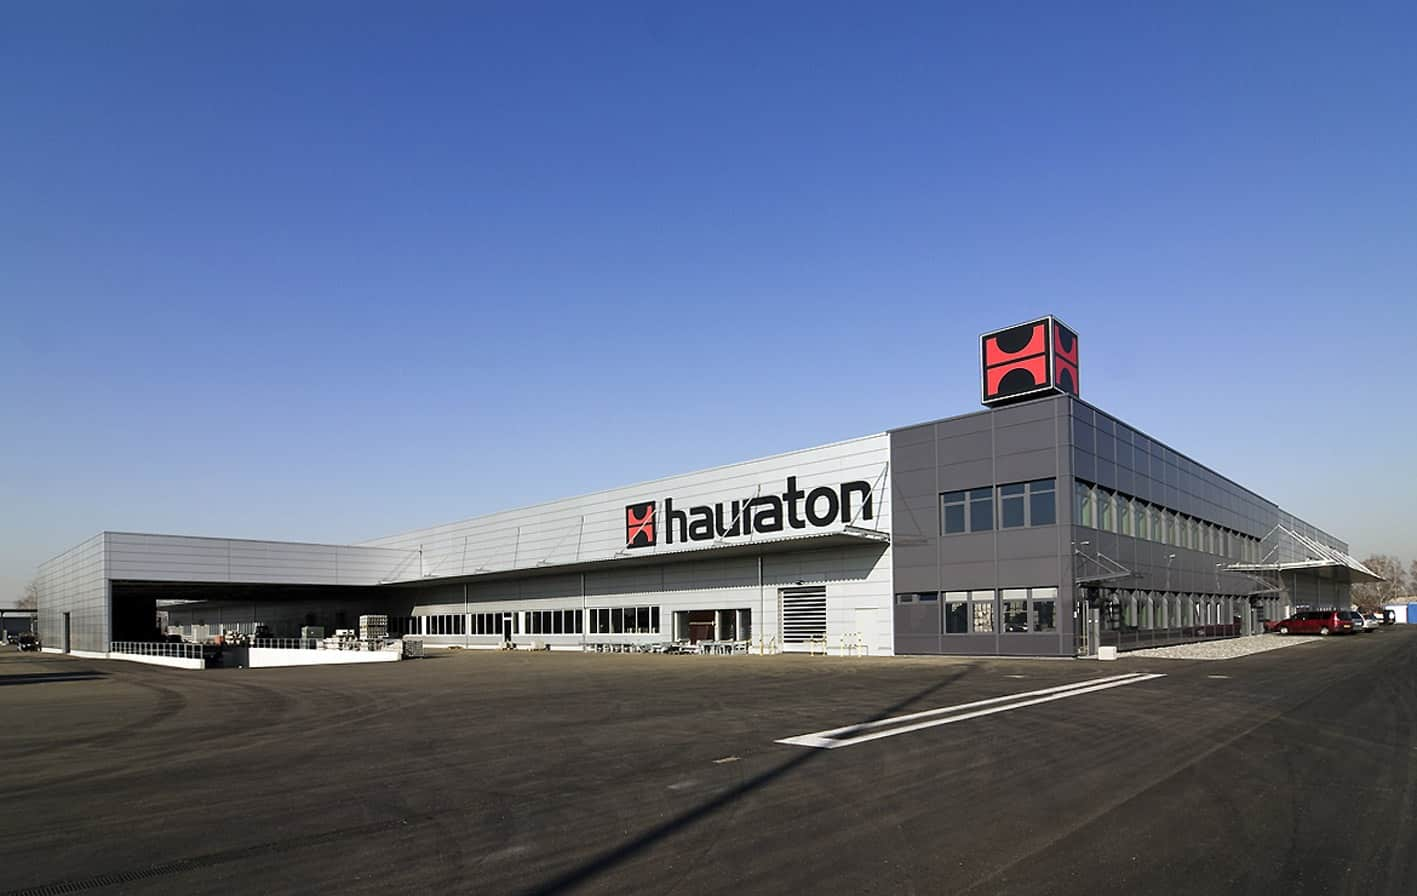 Lo stabilimento di Hauraton GmbH a Ötigheim (Germania)